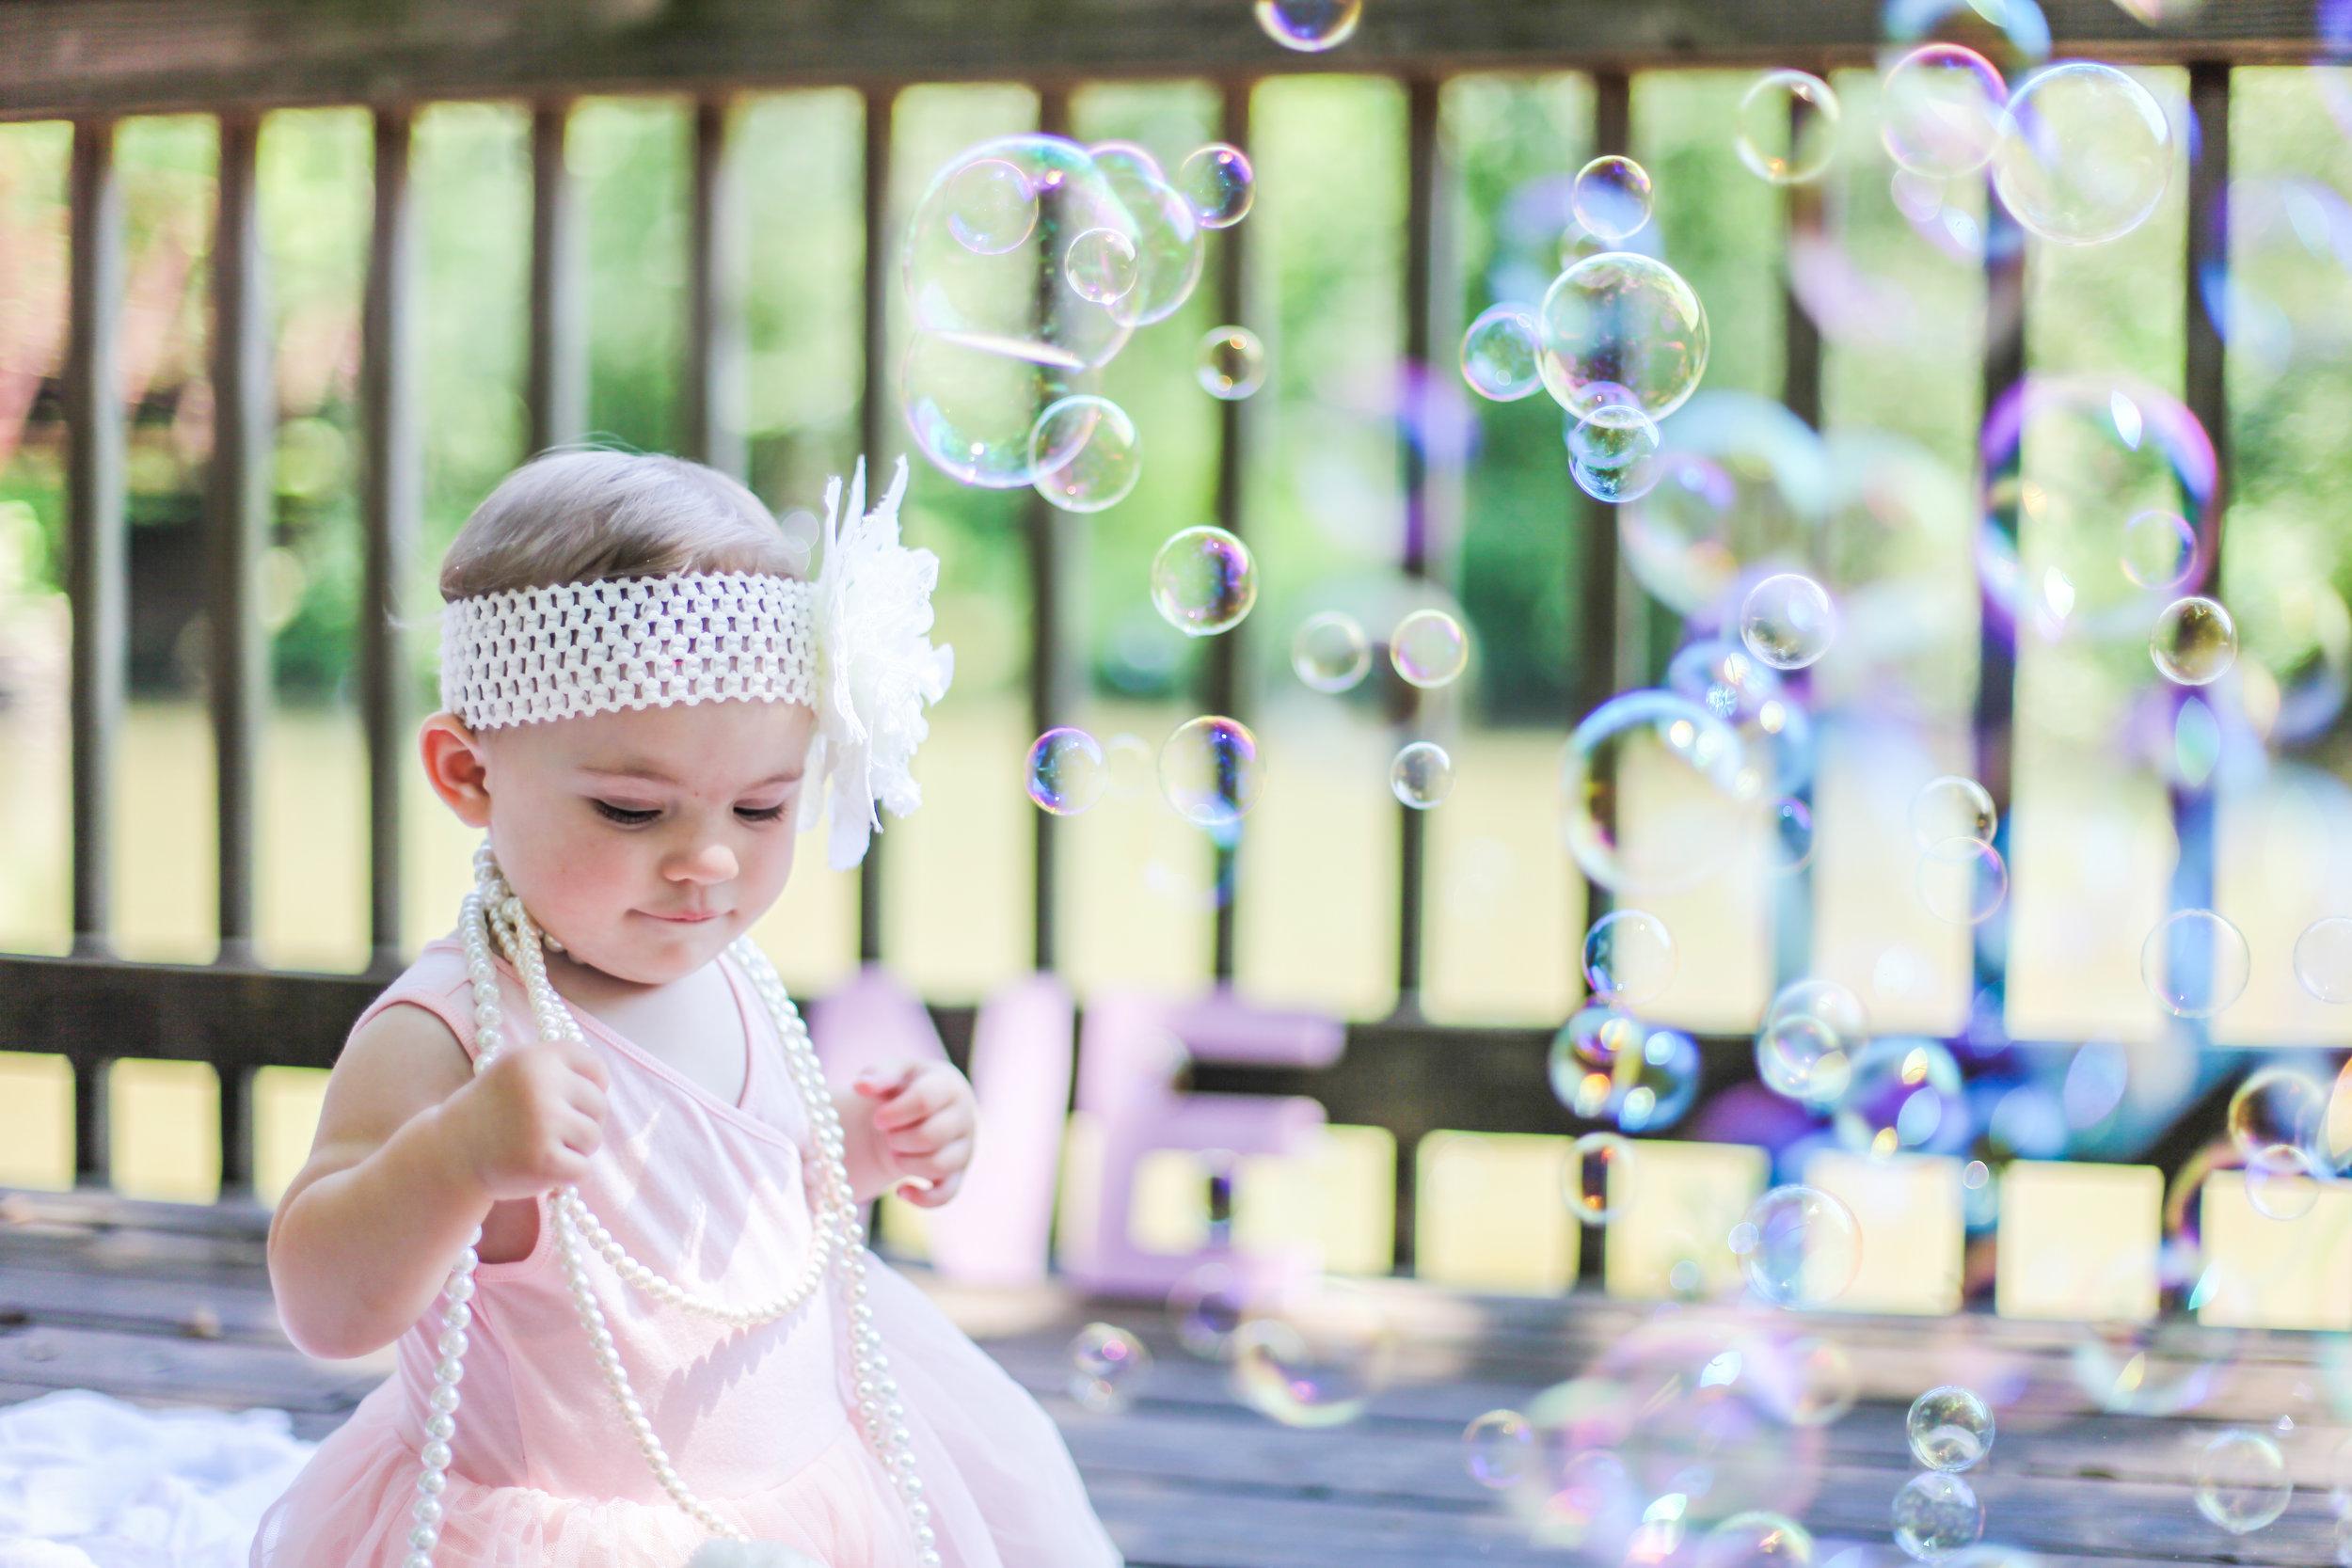 woodstock baby photography angela elliott-63.jpg